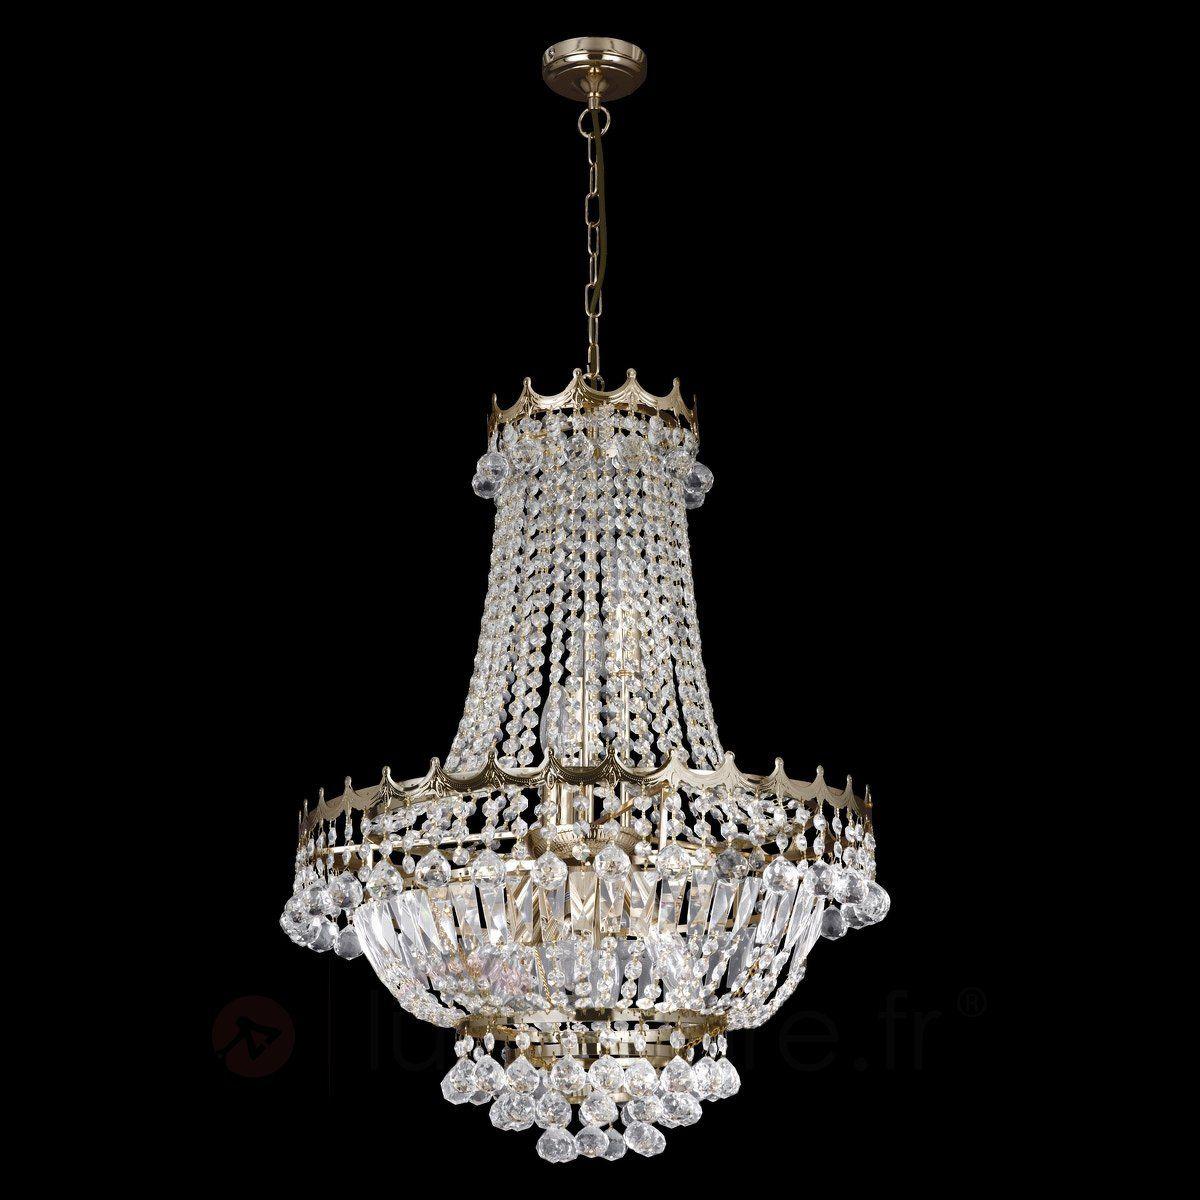 lustre cristal impressionnant versailles salon principal. Black Bedroom Furniture Sets. Home Design Ideas